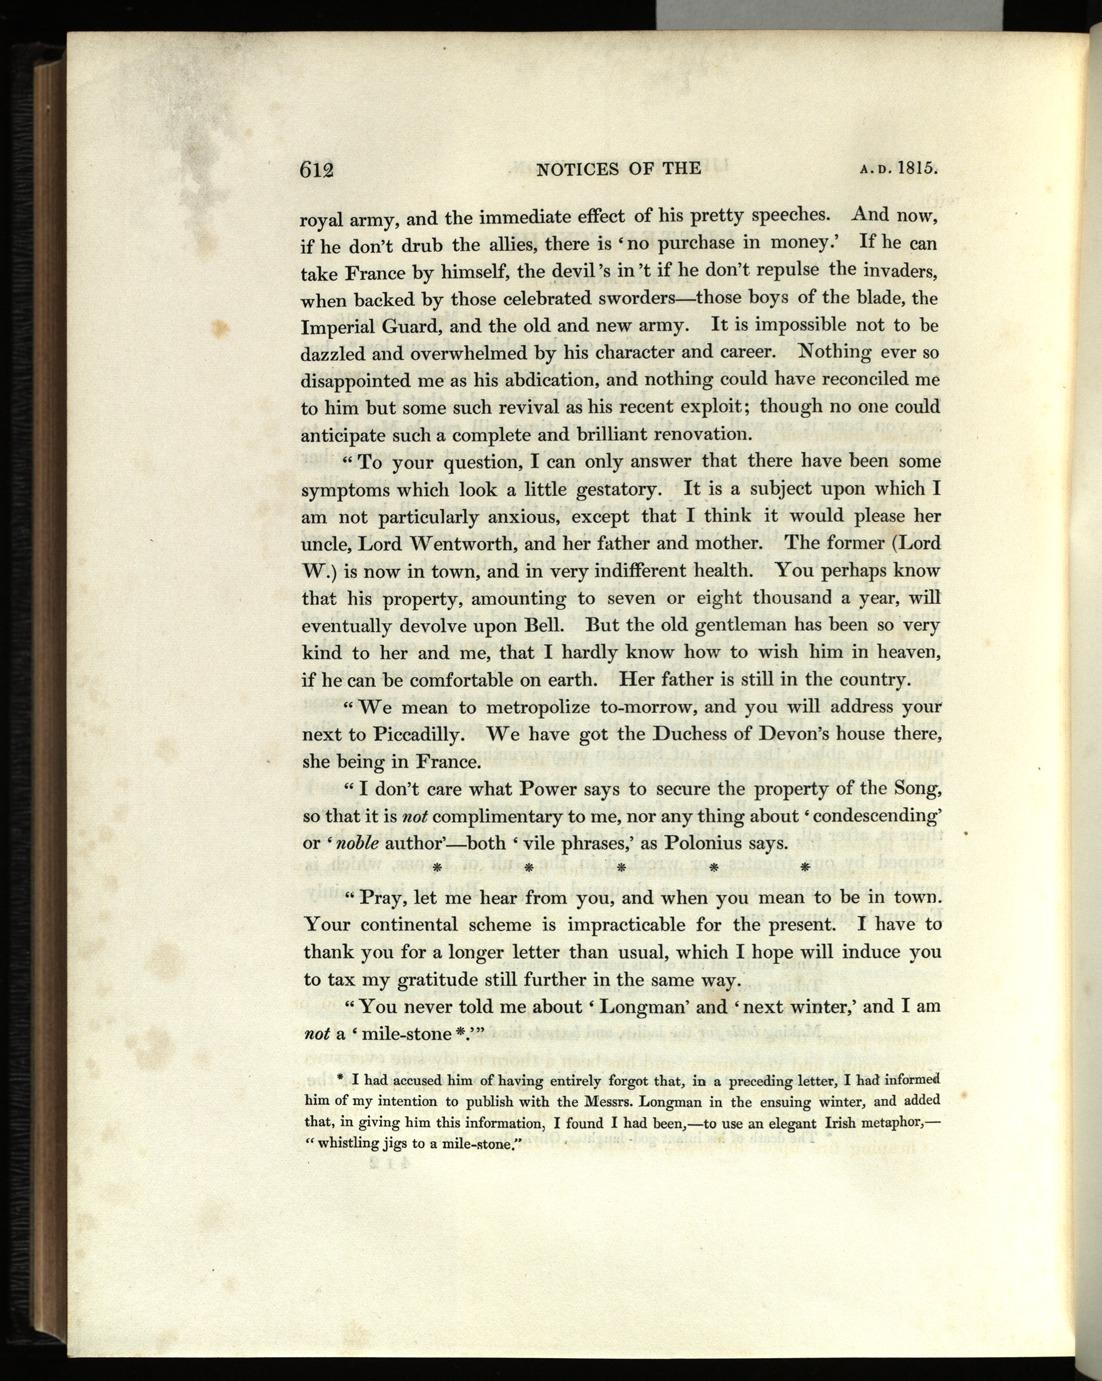 Bryon letter p. 2.jpg